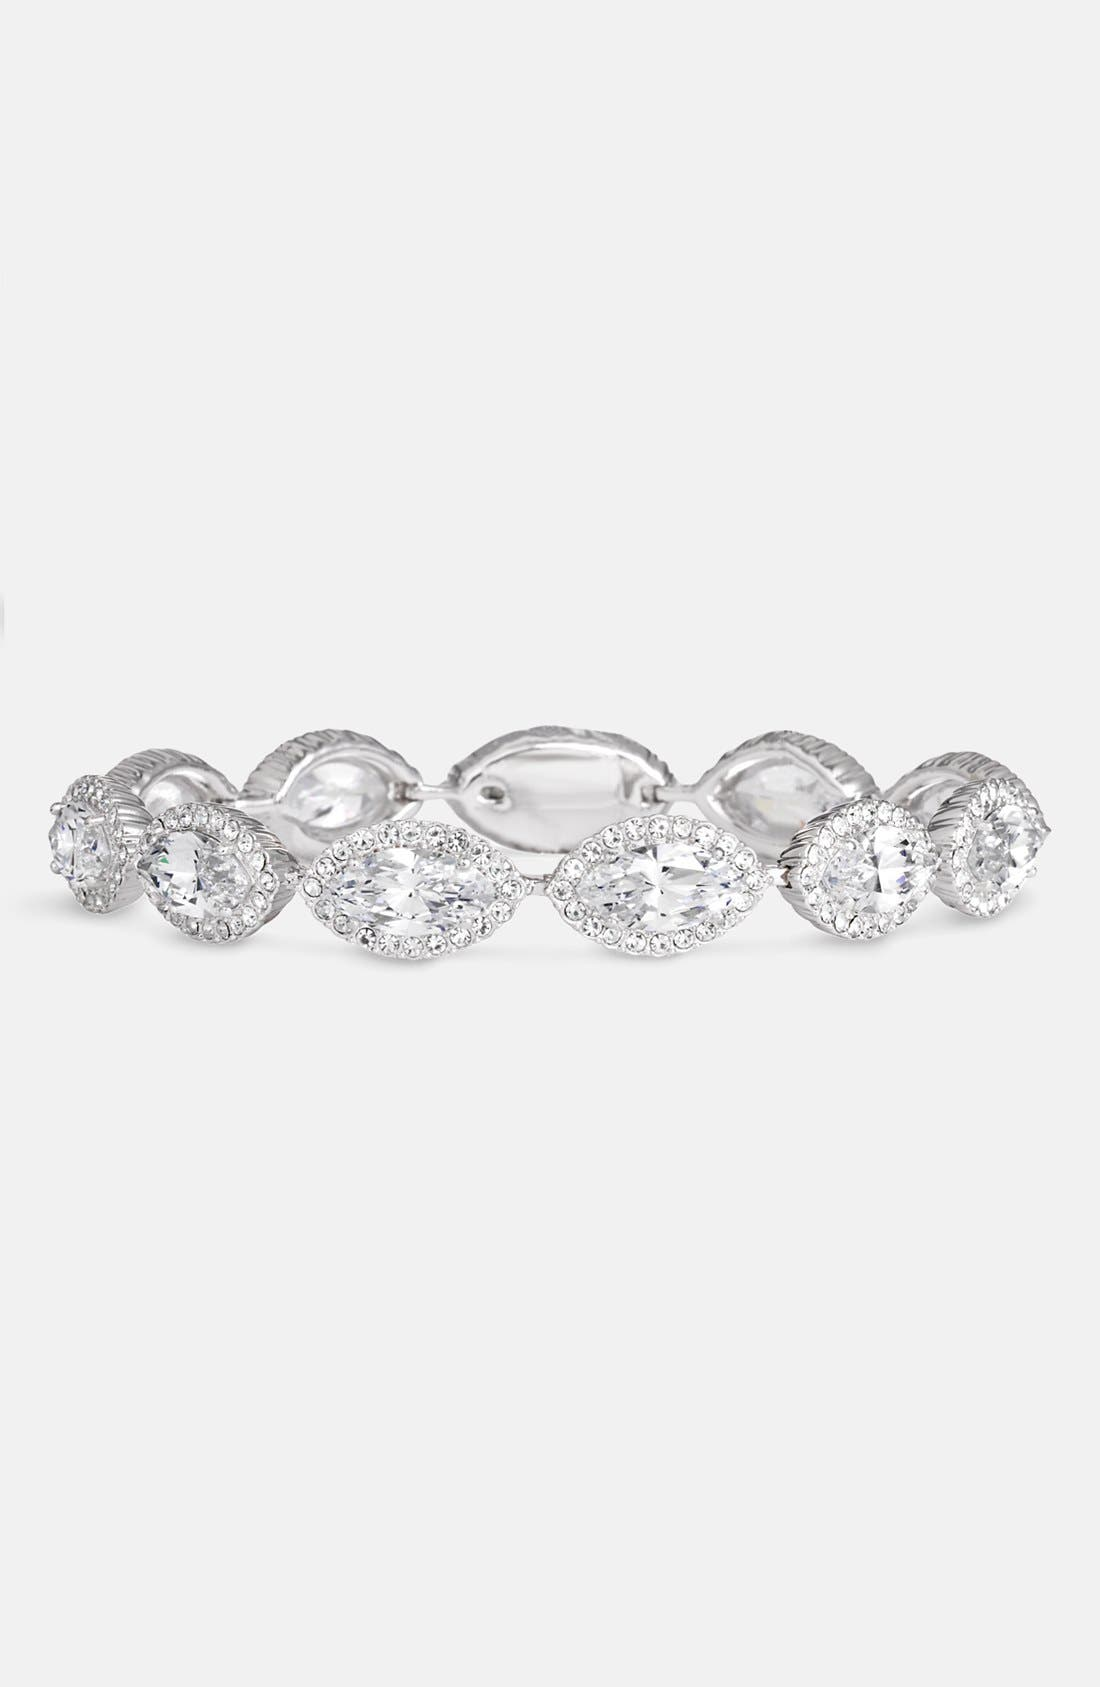 Main Image - Nadri 'Marquise' Cubic Zirconia Bracelet